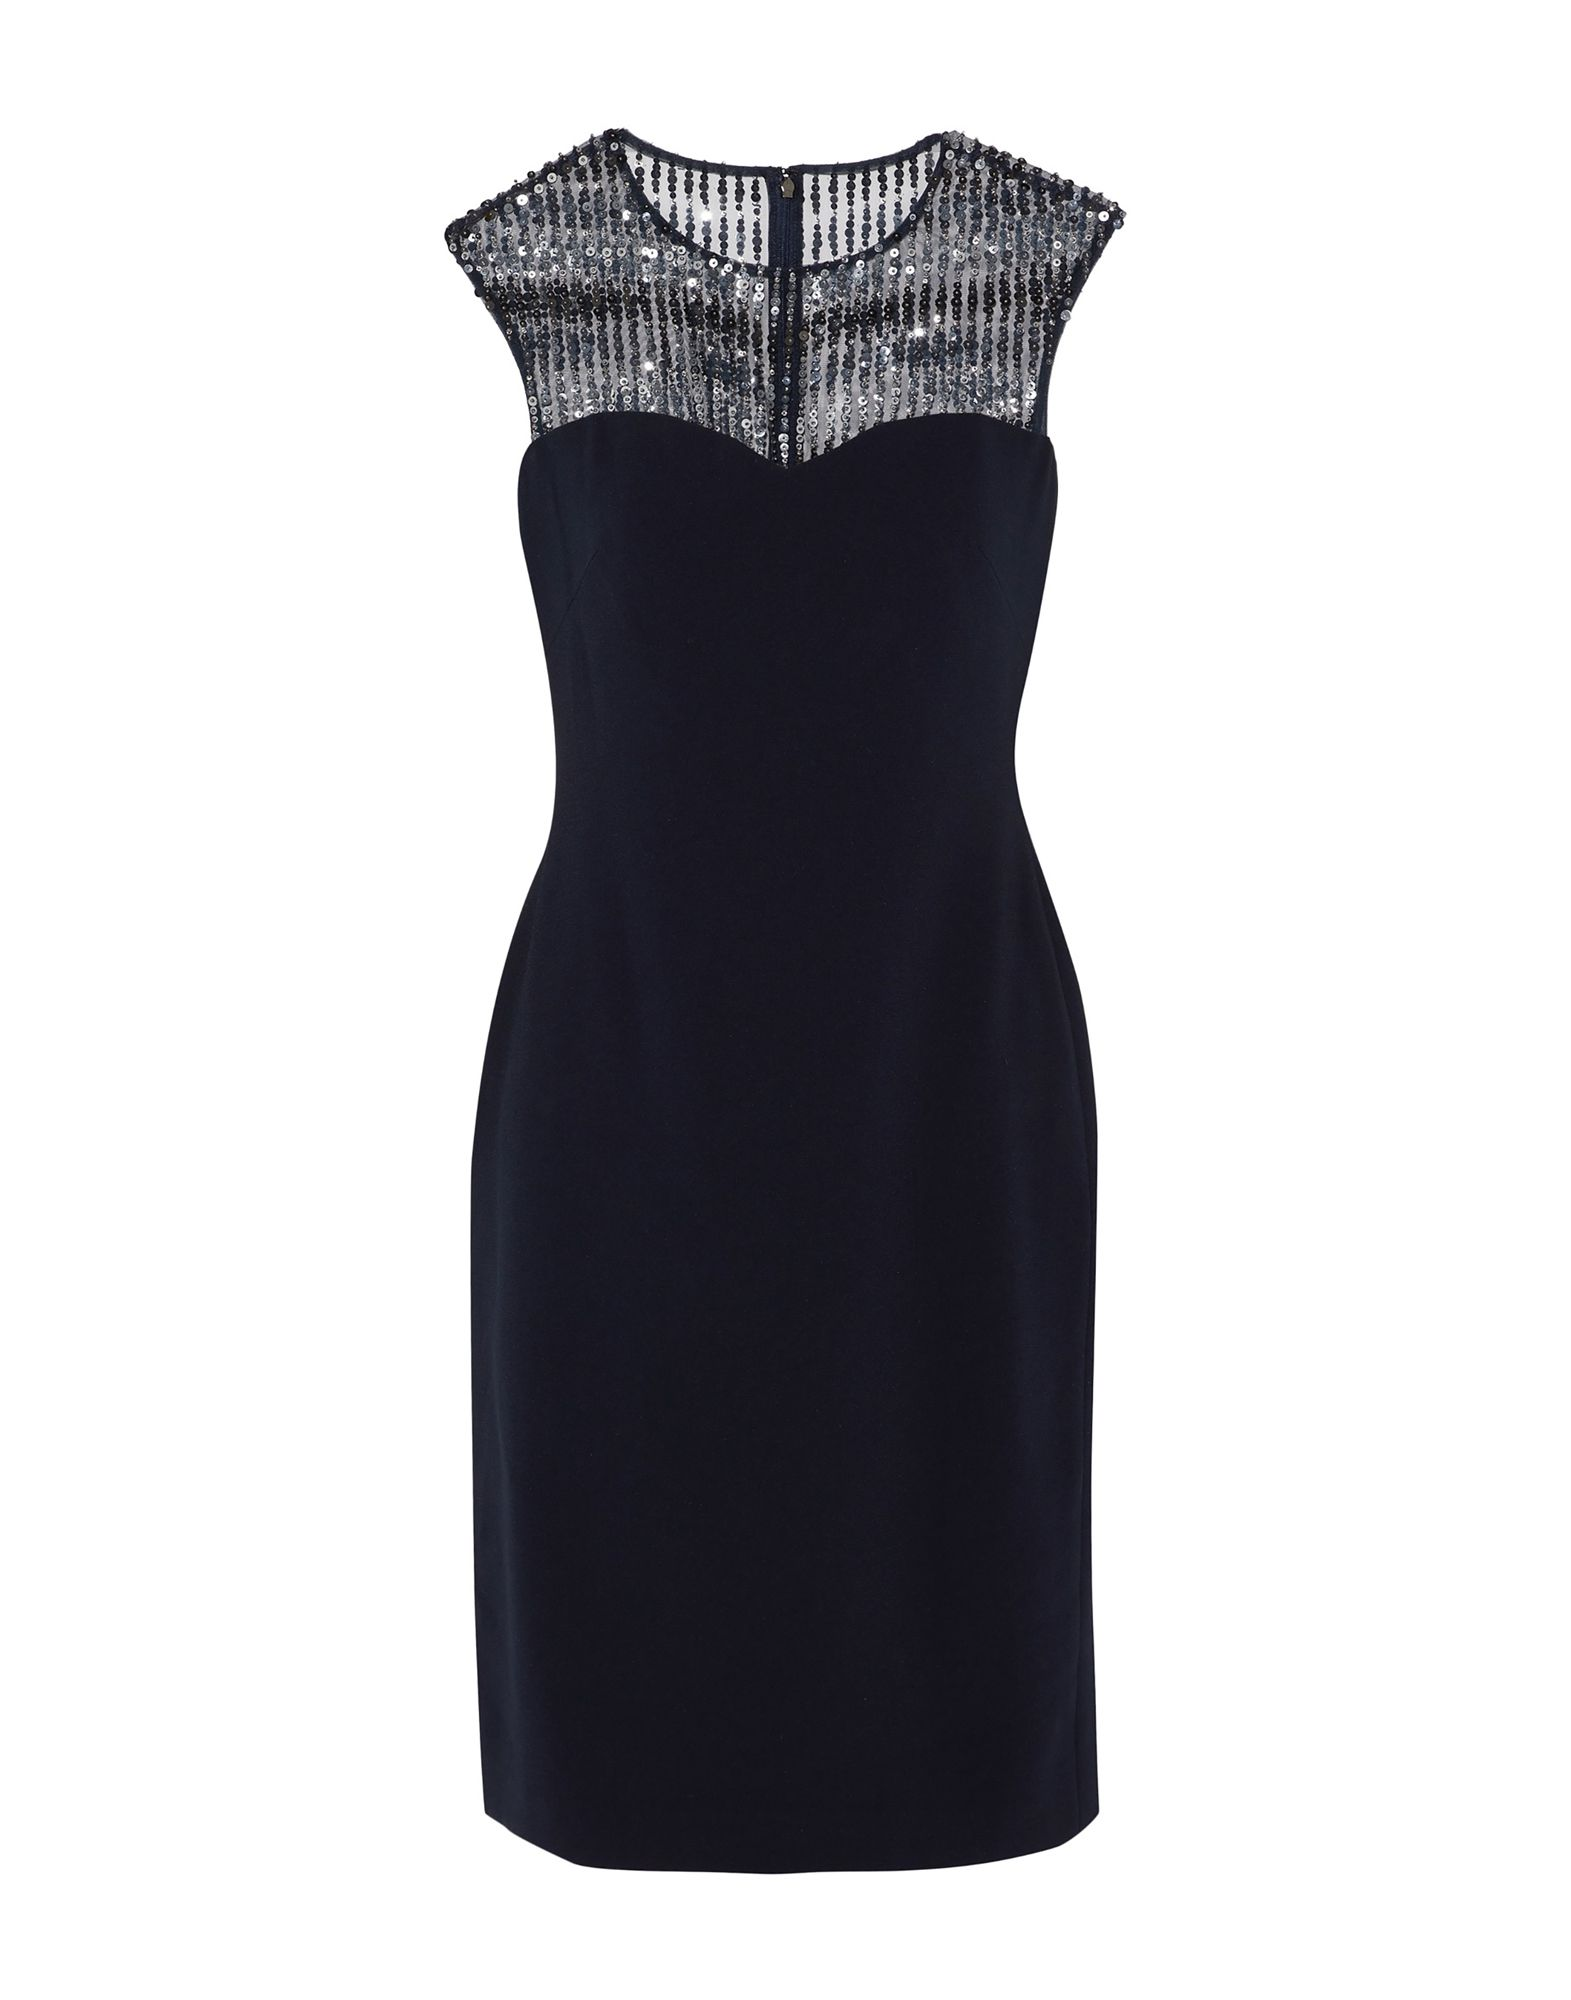 MIKAEL AGHAL Knee-Length Dresses in Dark Blue